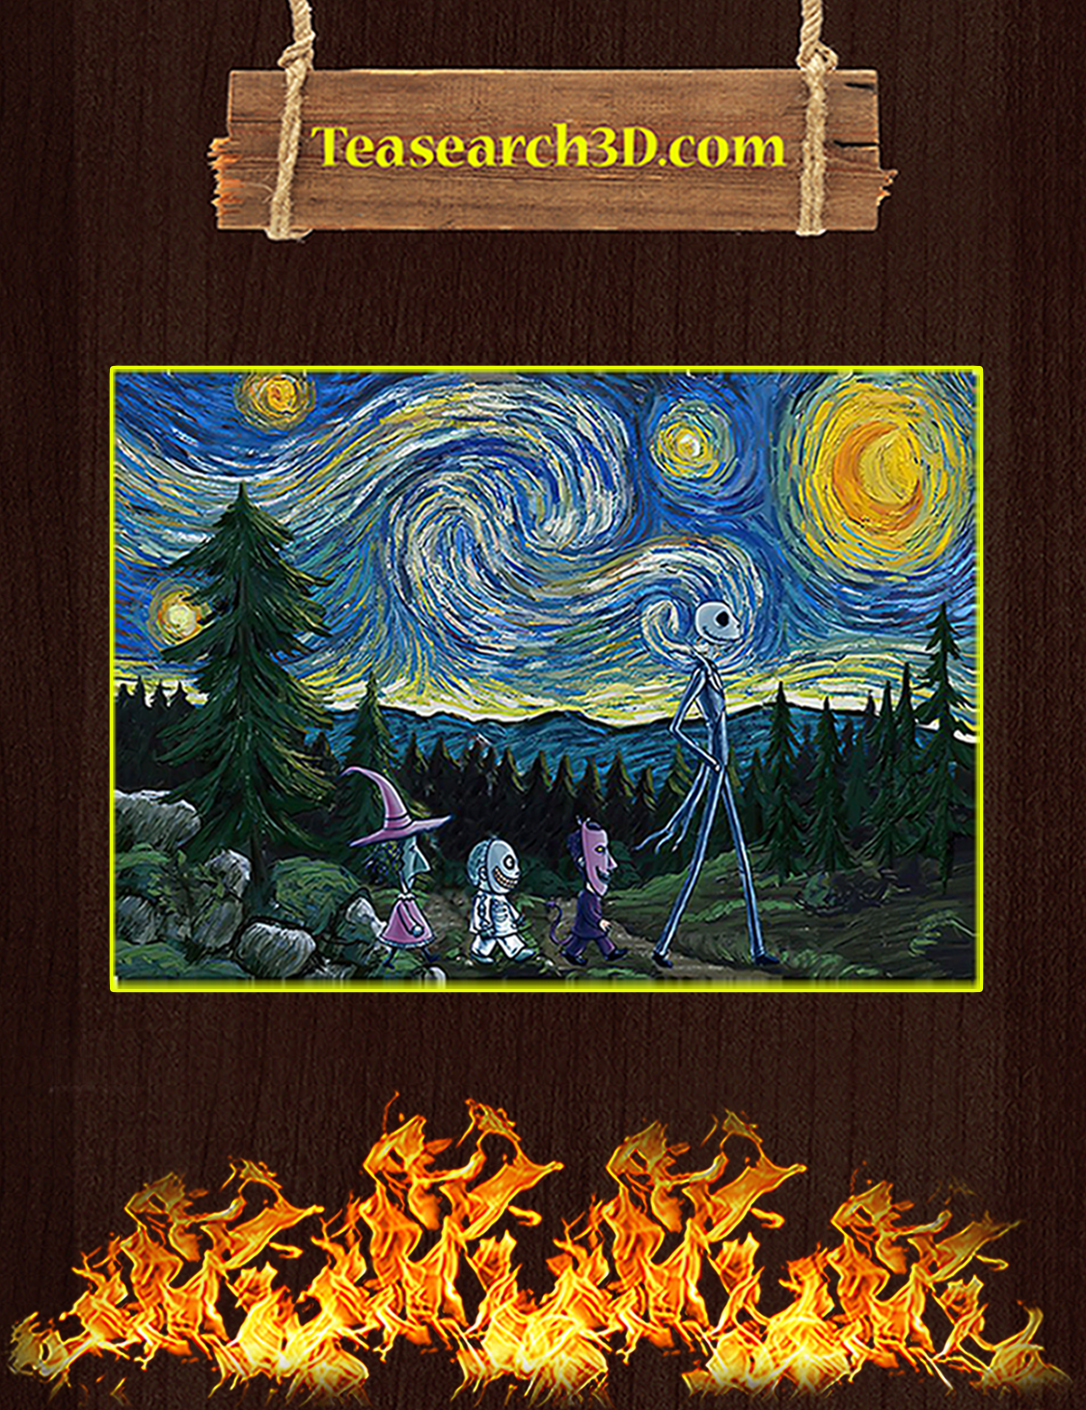 Jack skellinton starry nightmare poster A2